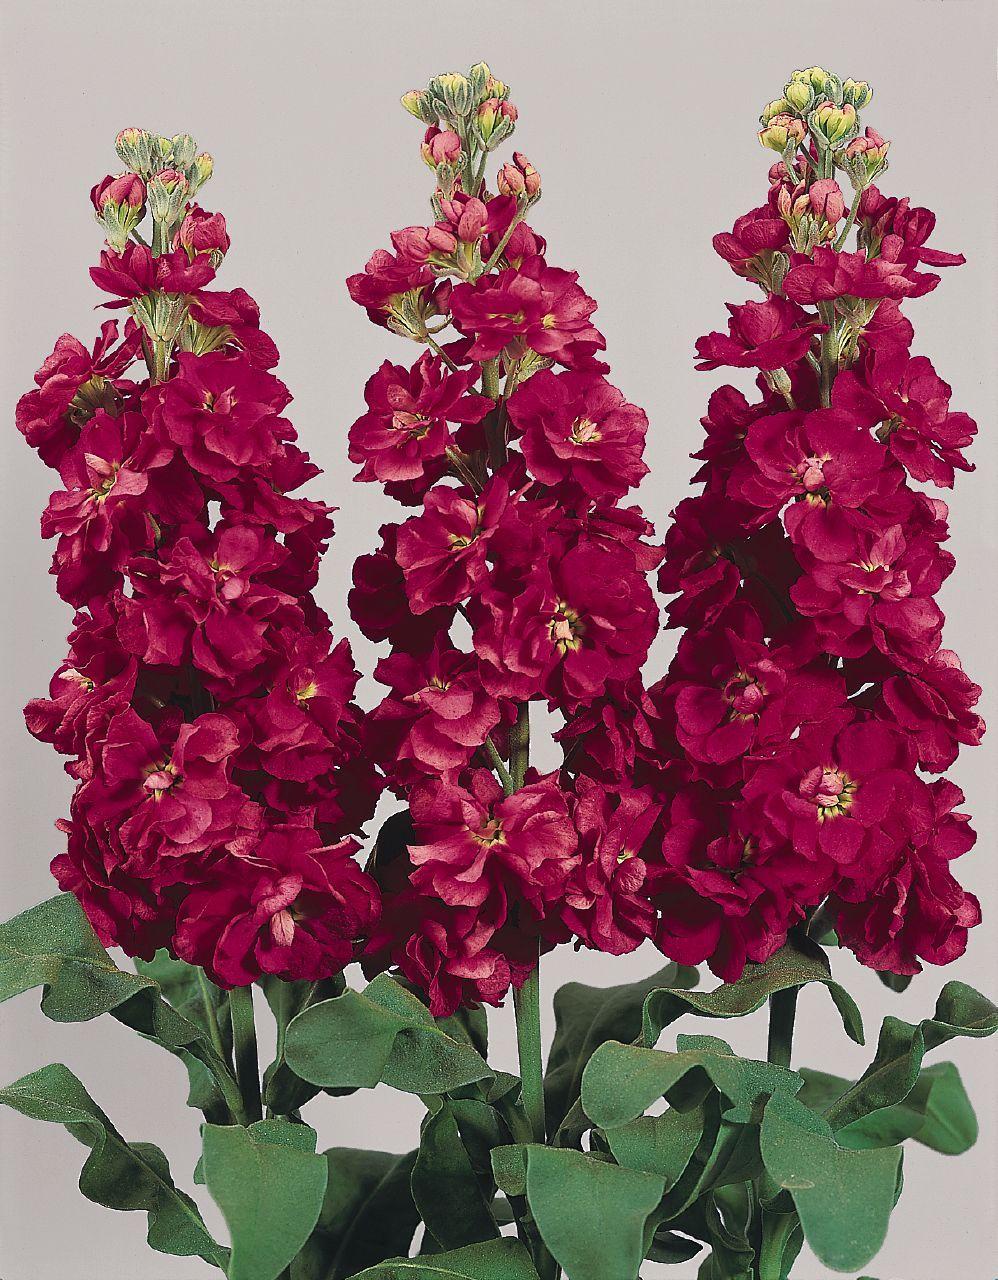 Come Coltivare I Lamponi matthiola incana seeds need light and continuous moisture to